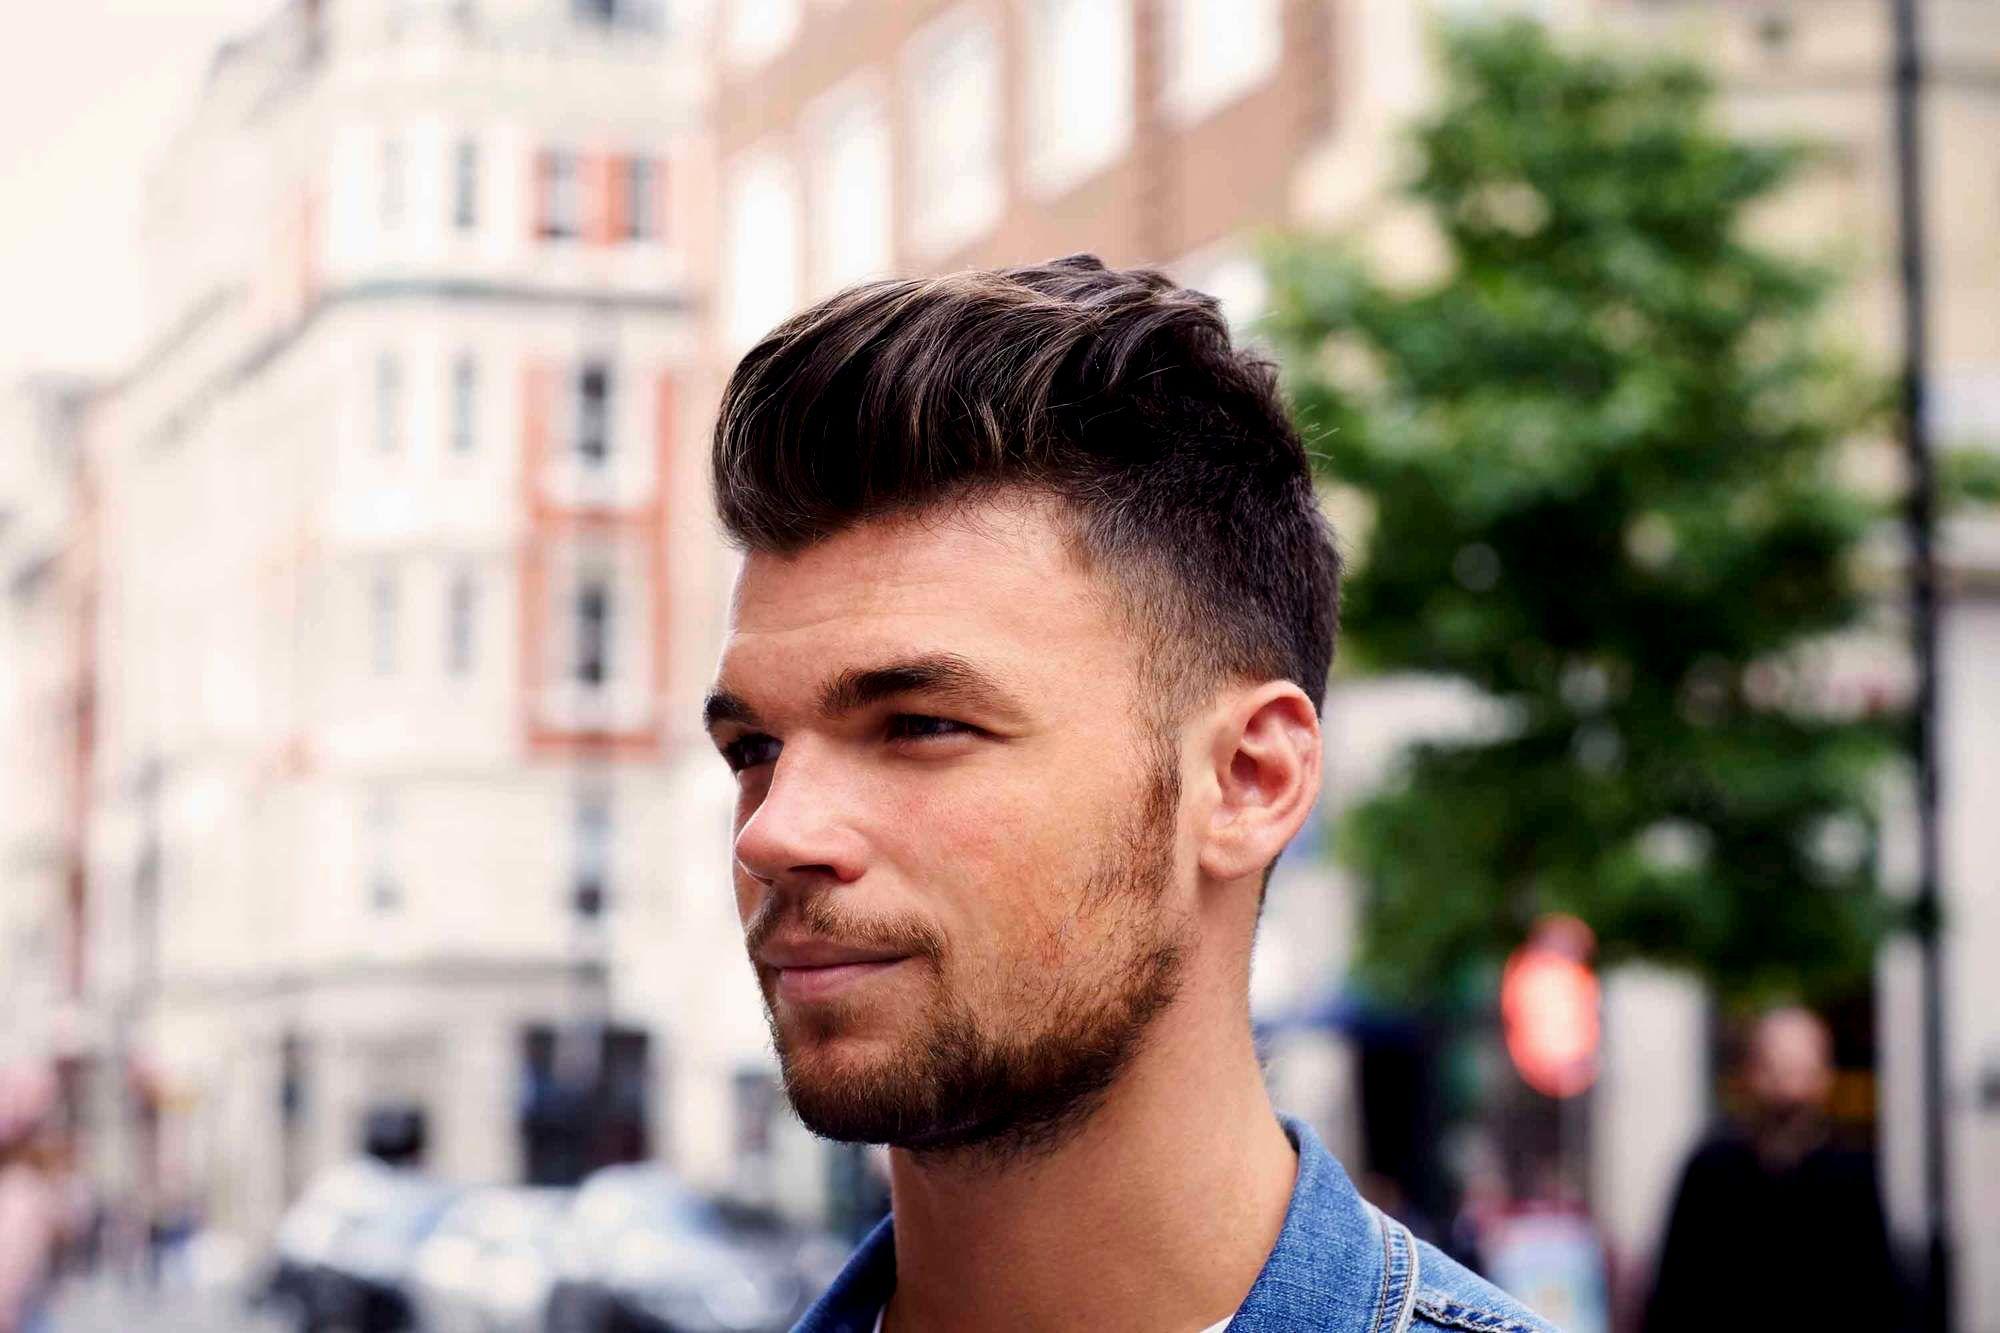 melhor cortes de cabelo masculino 2017 modelo-Top Cortes De Cabelo Masculino 2017 Foto